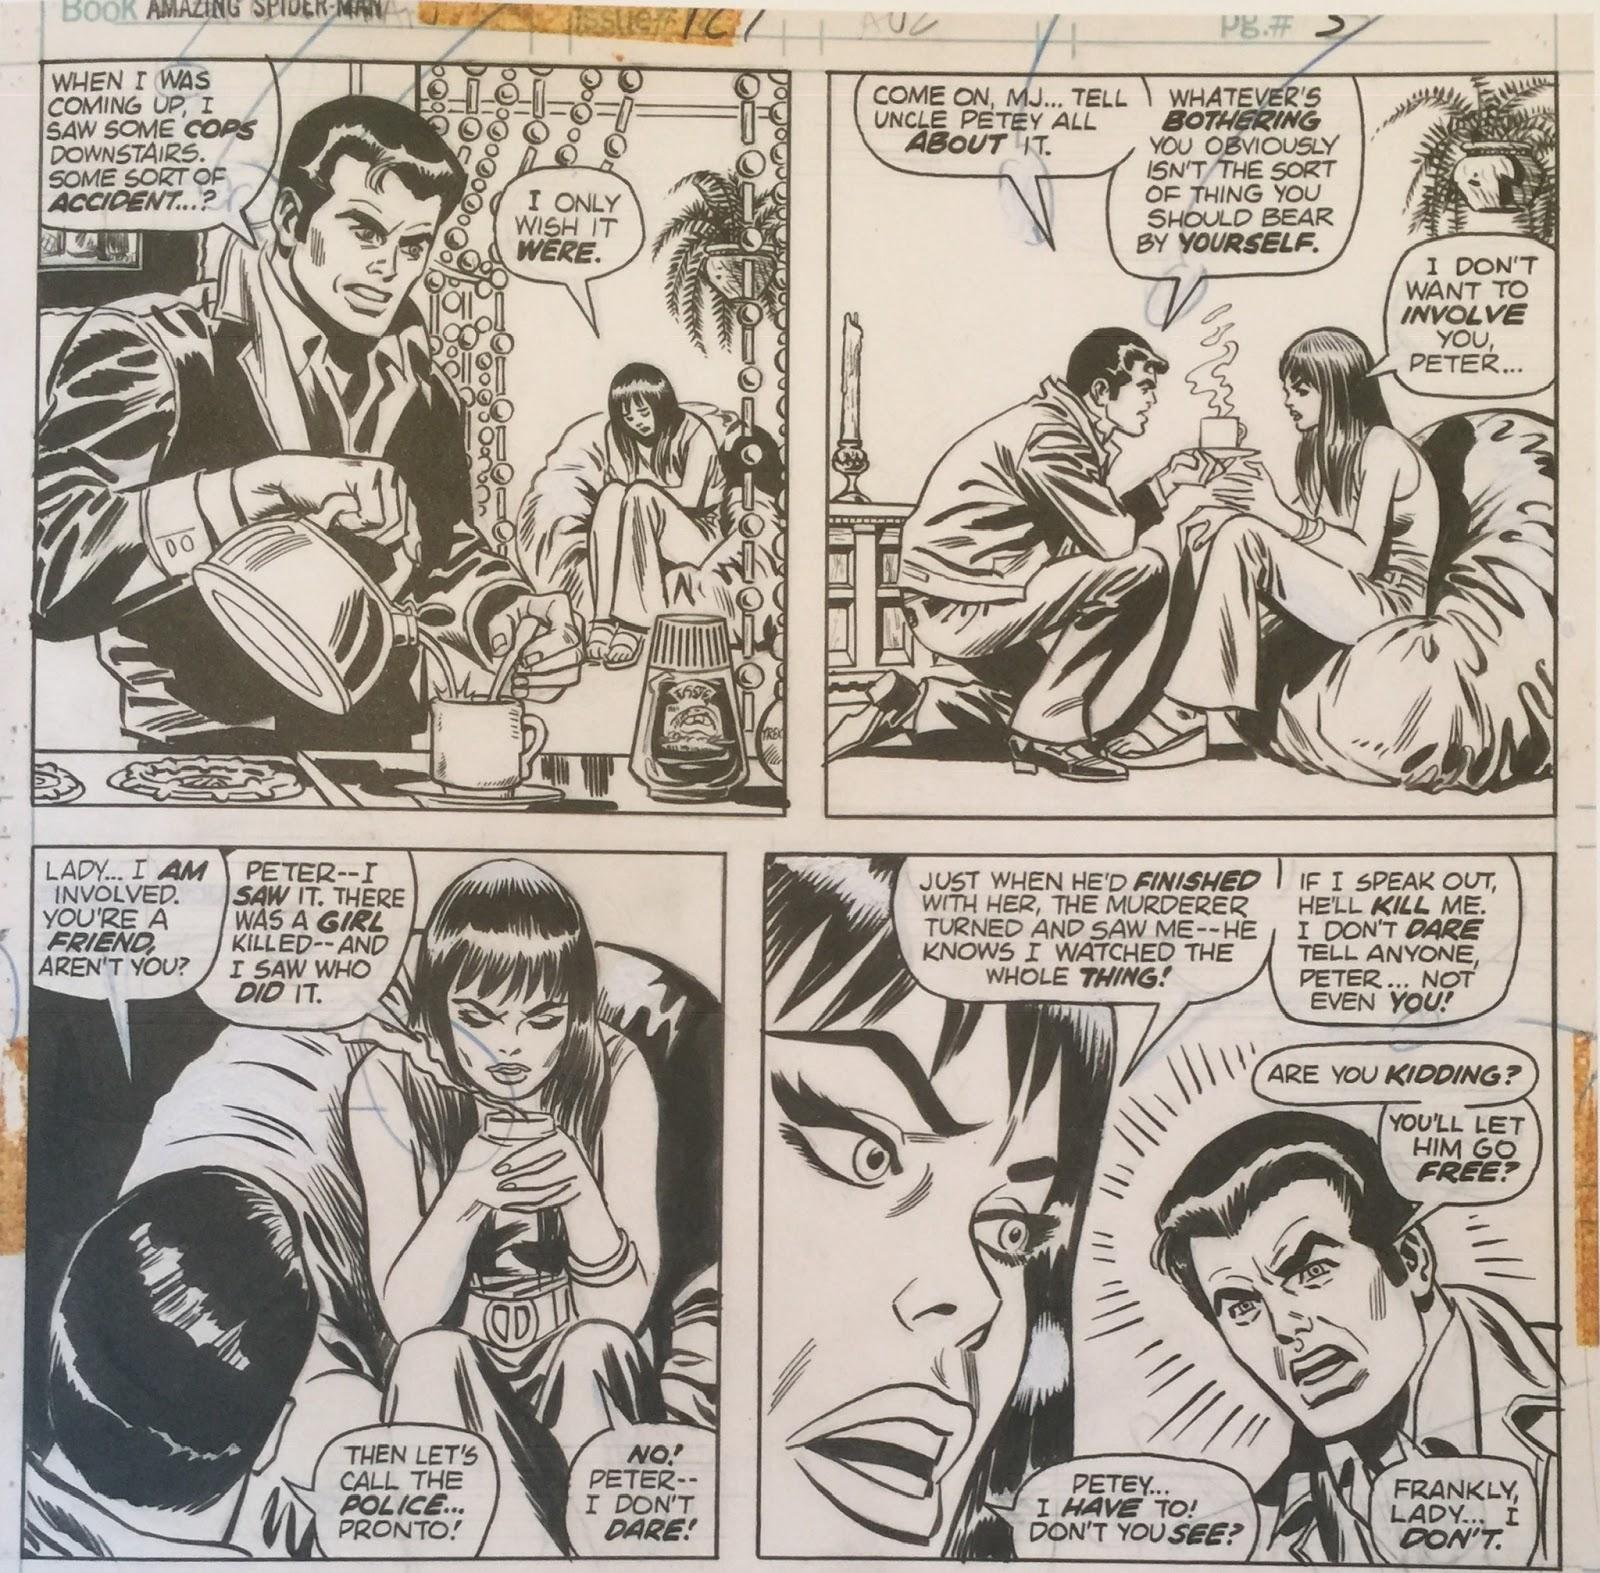 b2ea261da91 Black   White and Bronze!  Ross Andru s Amazing Spider-Man Artist ...